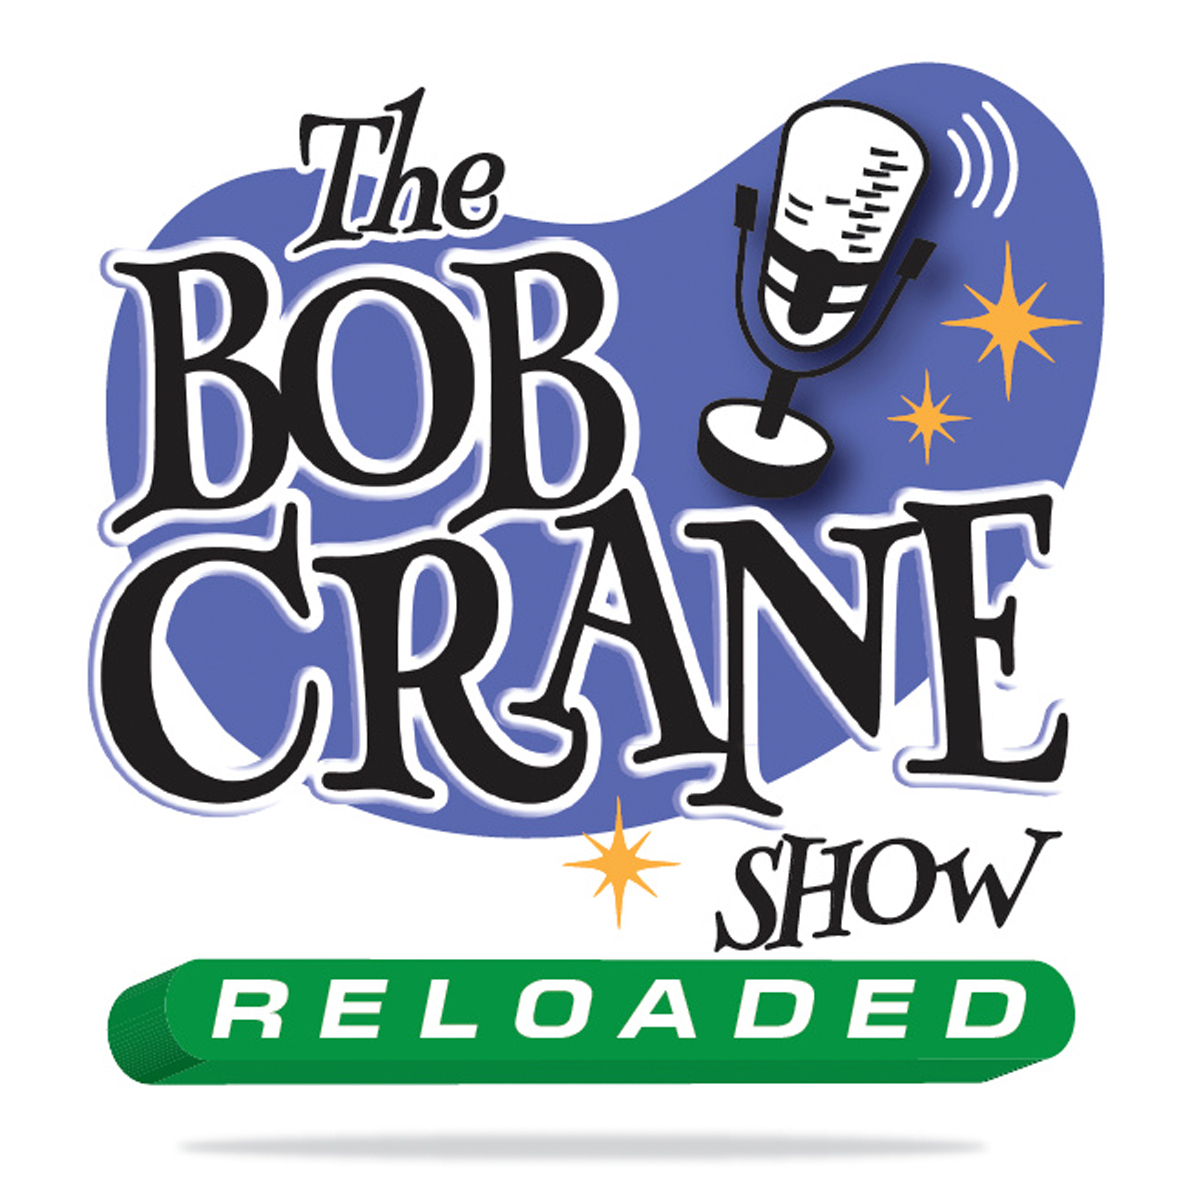 The Bob Crane Show: Reloaded